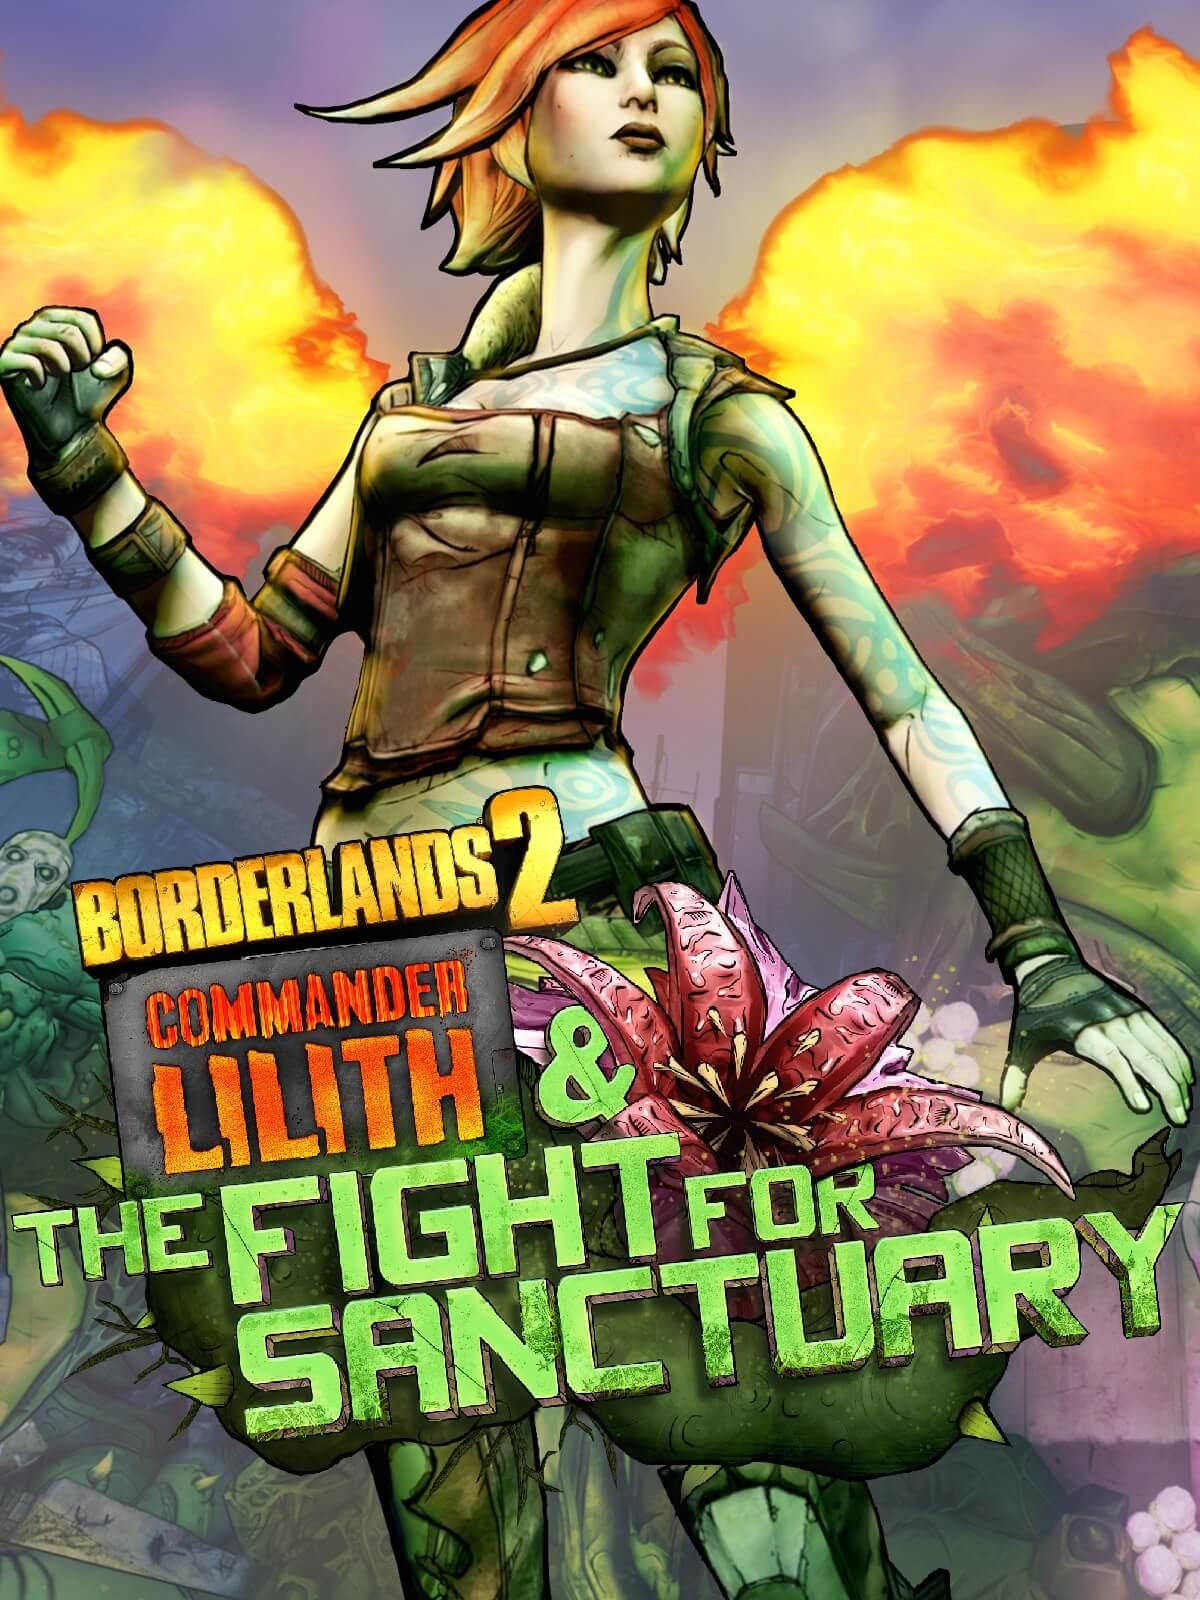 Borderlands 2 - Commander Lilith & the Fight for Sanctuary per PC, gratis